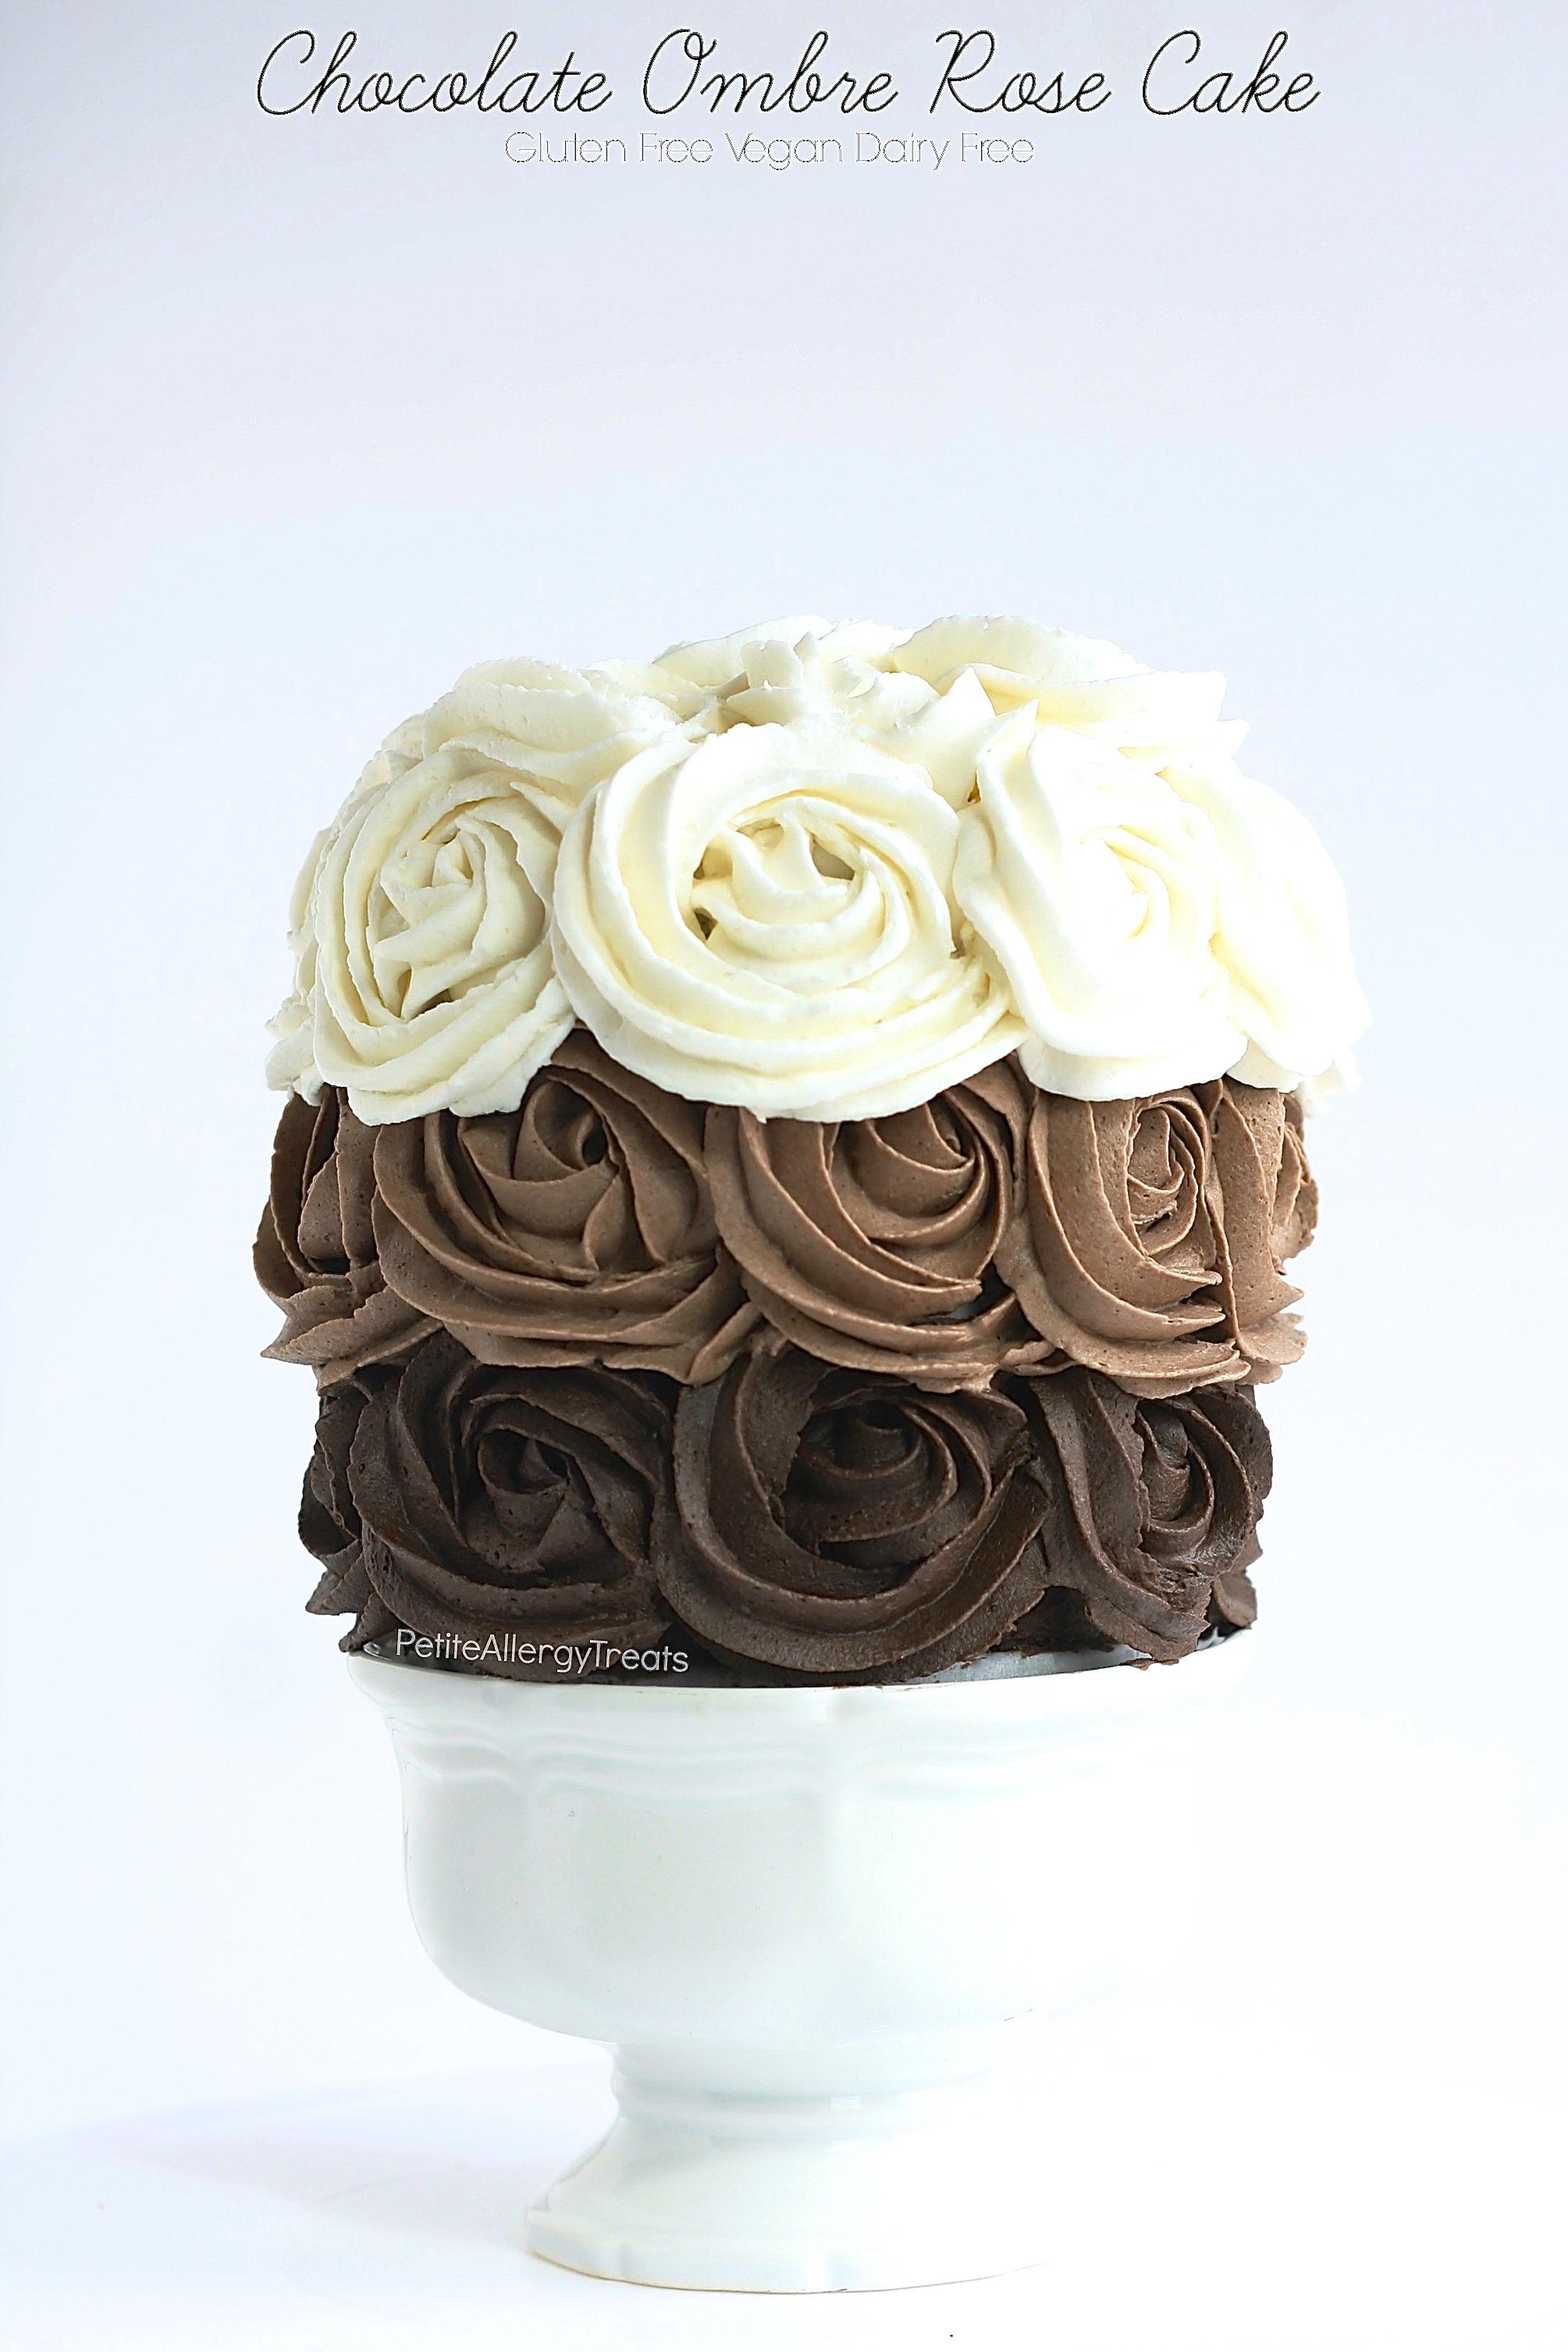 Gluten Free Vegan Chocolate Cake Dairy Free Petite Allergy Treats